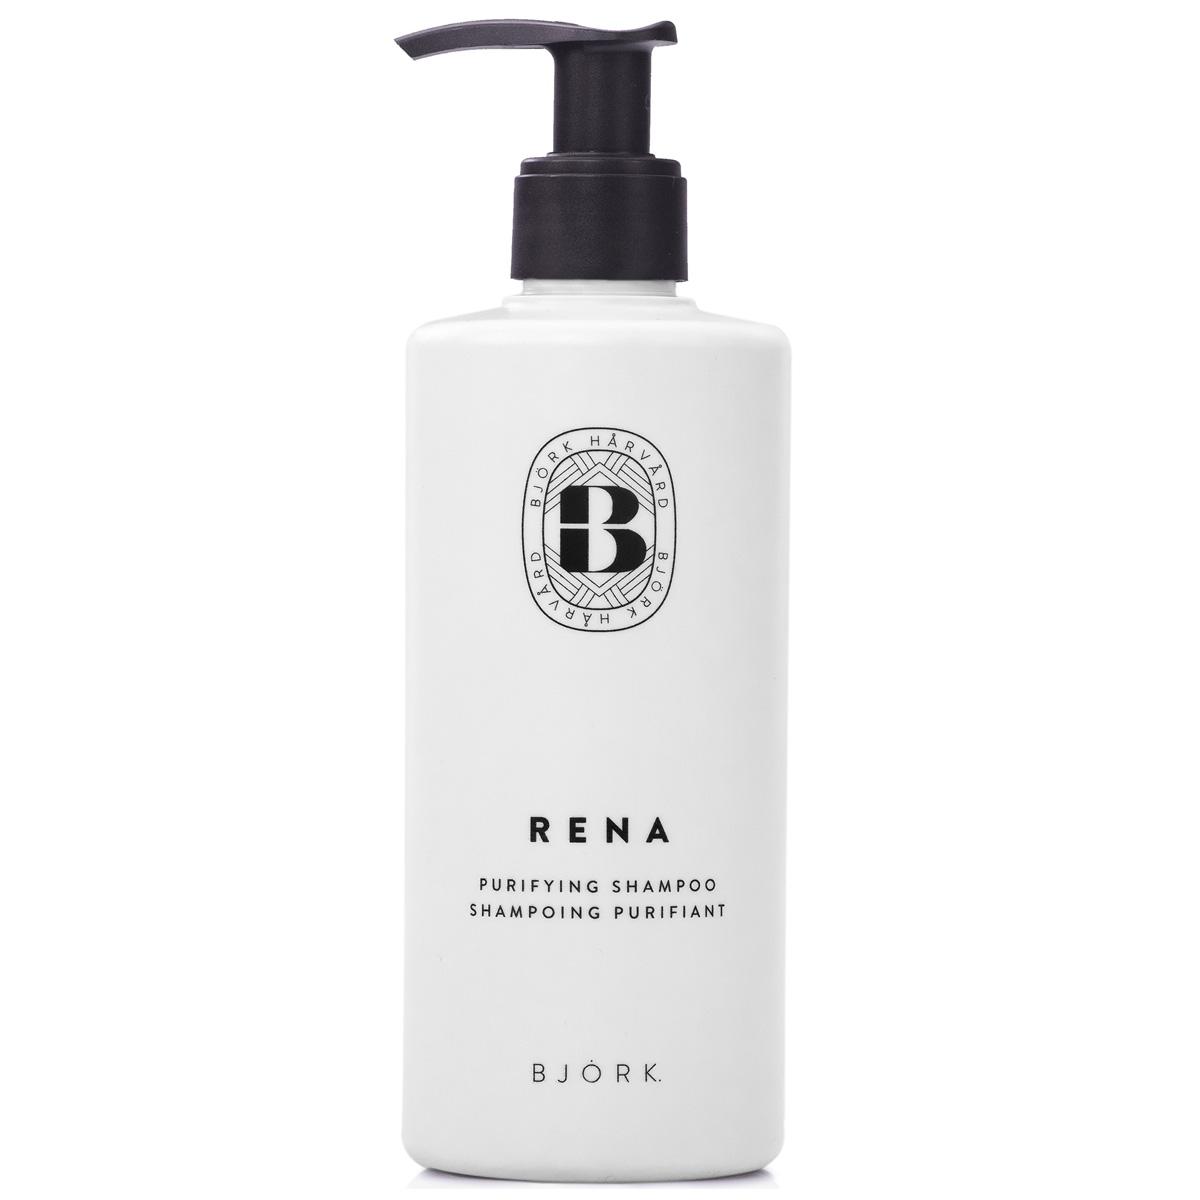 Björk Rena Purifying Detox Shampoo, 300ml